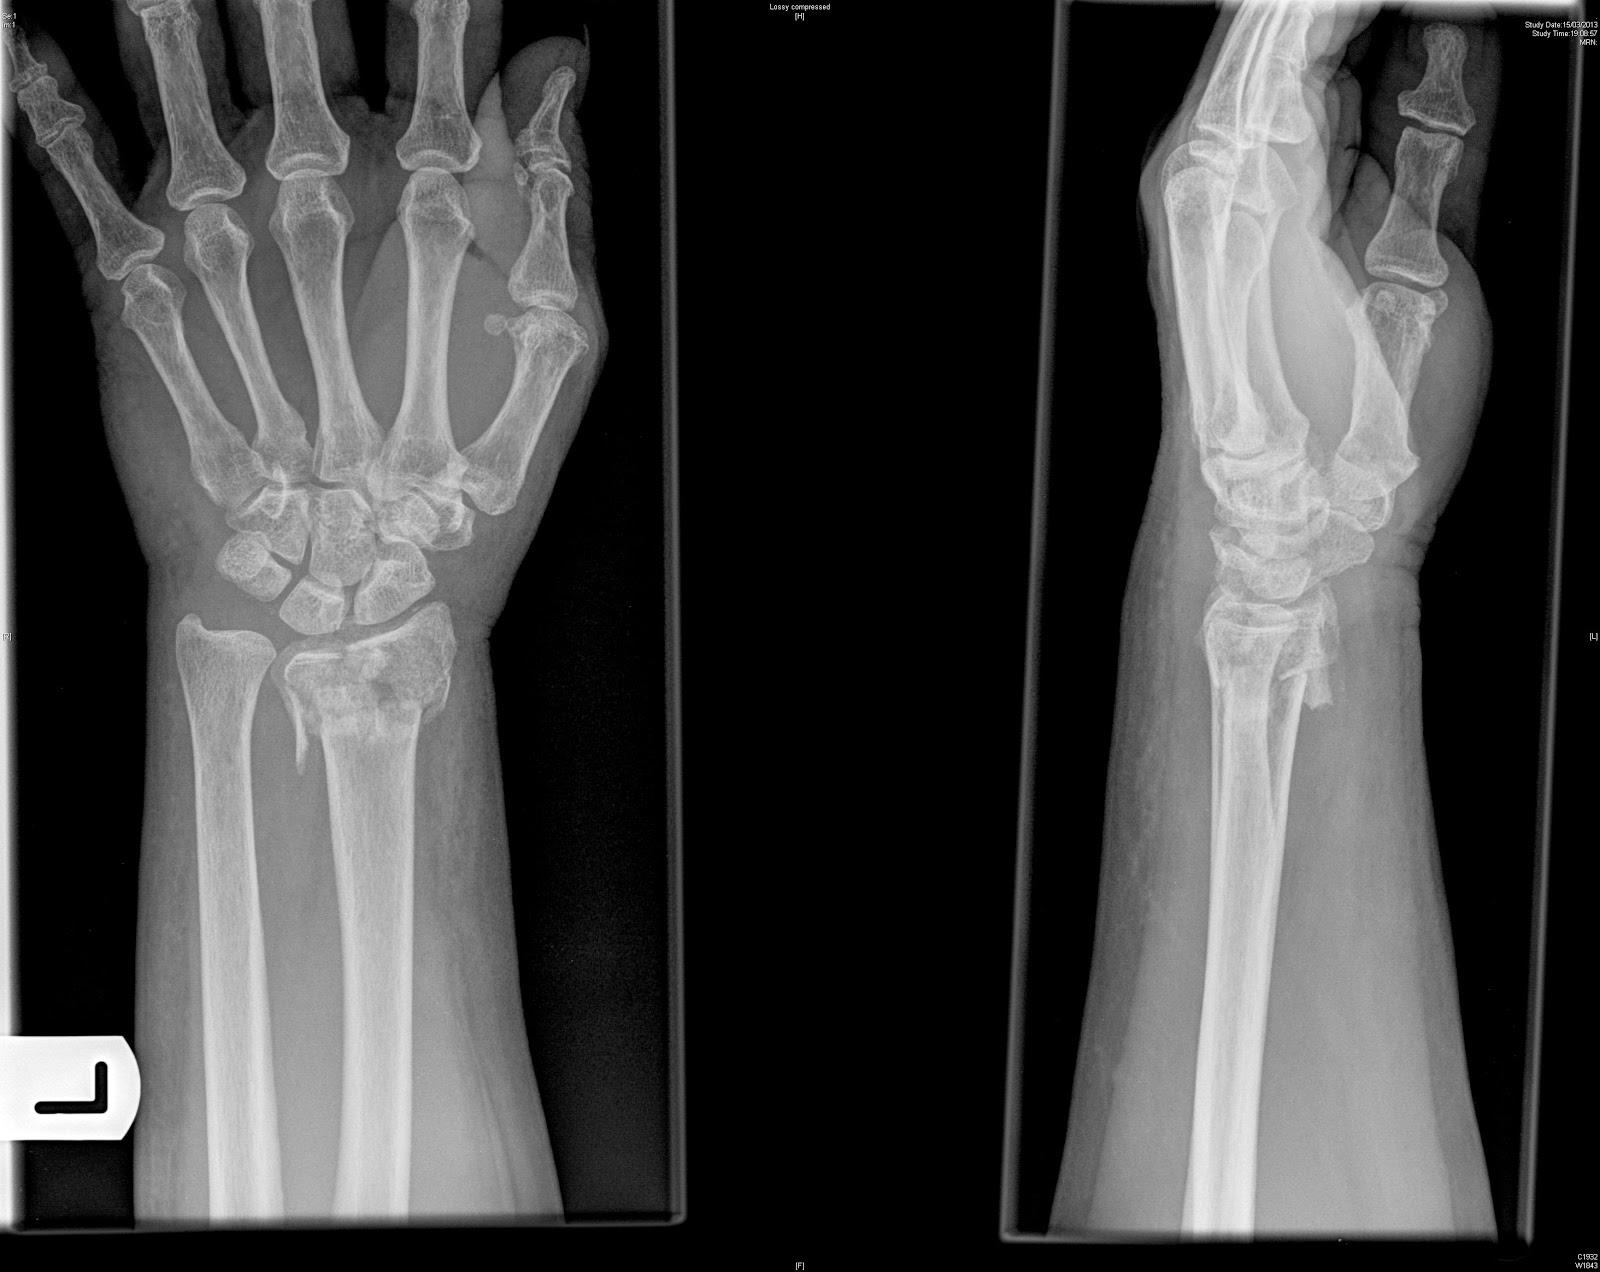 Colles' Fracture Distal Radius-4.bp.blogspot.com